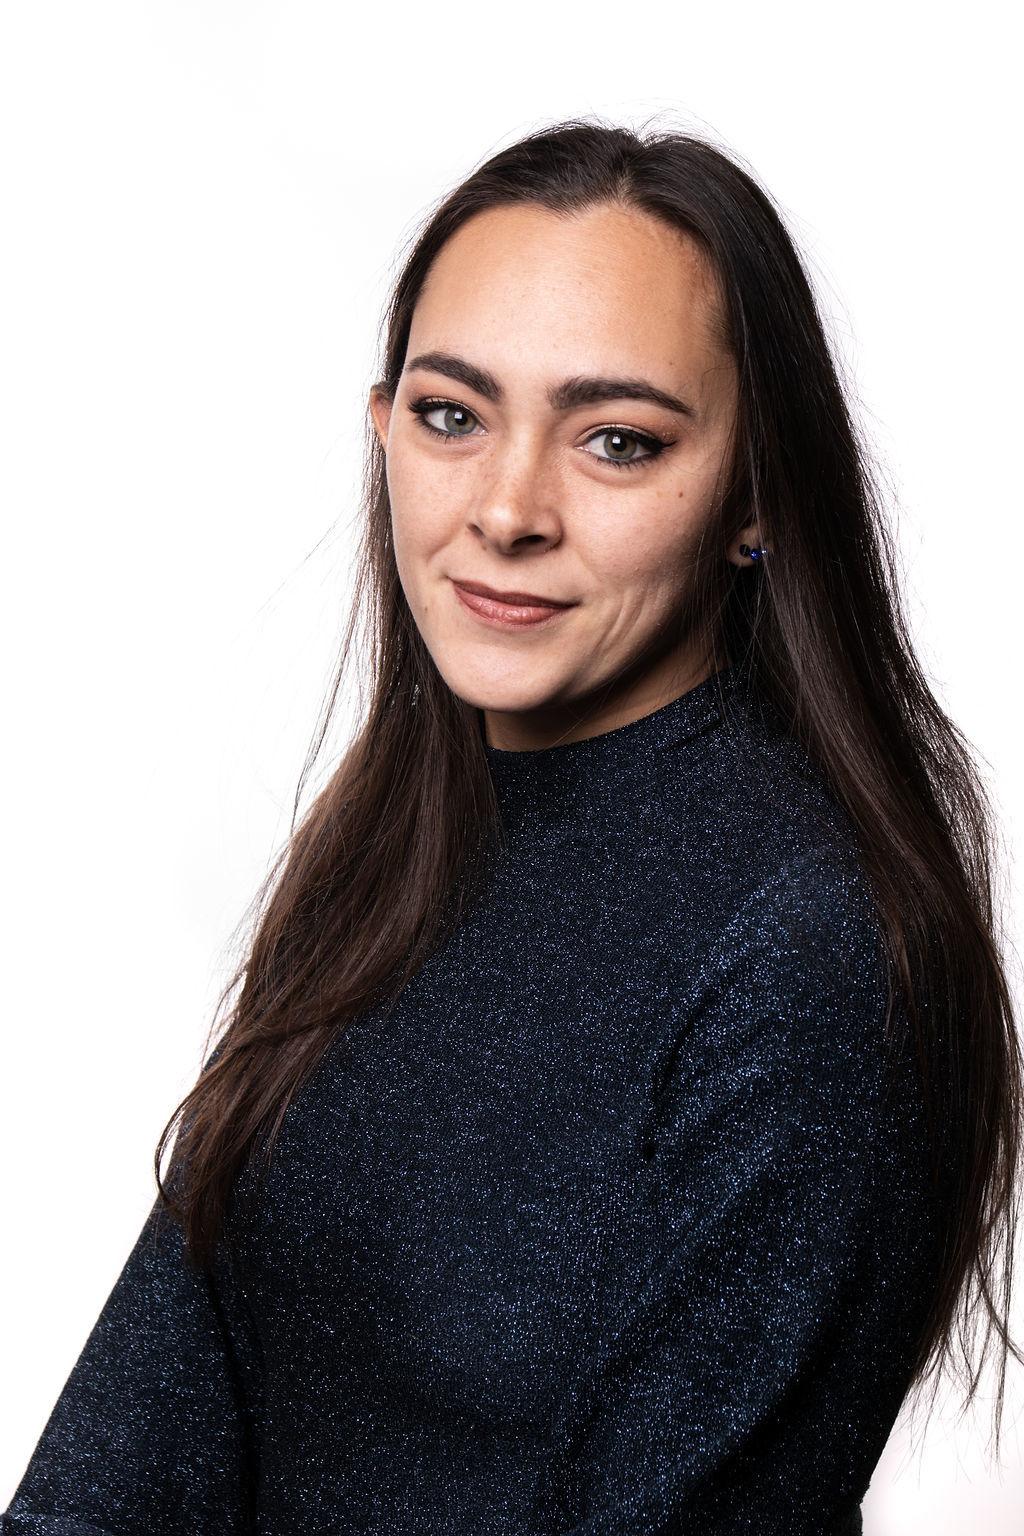 Sjéra Dijkstra